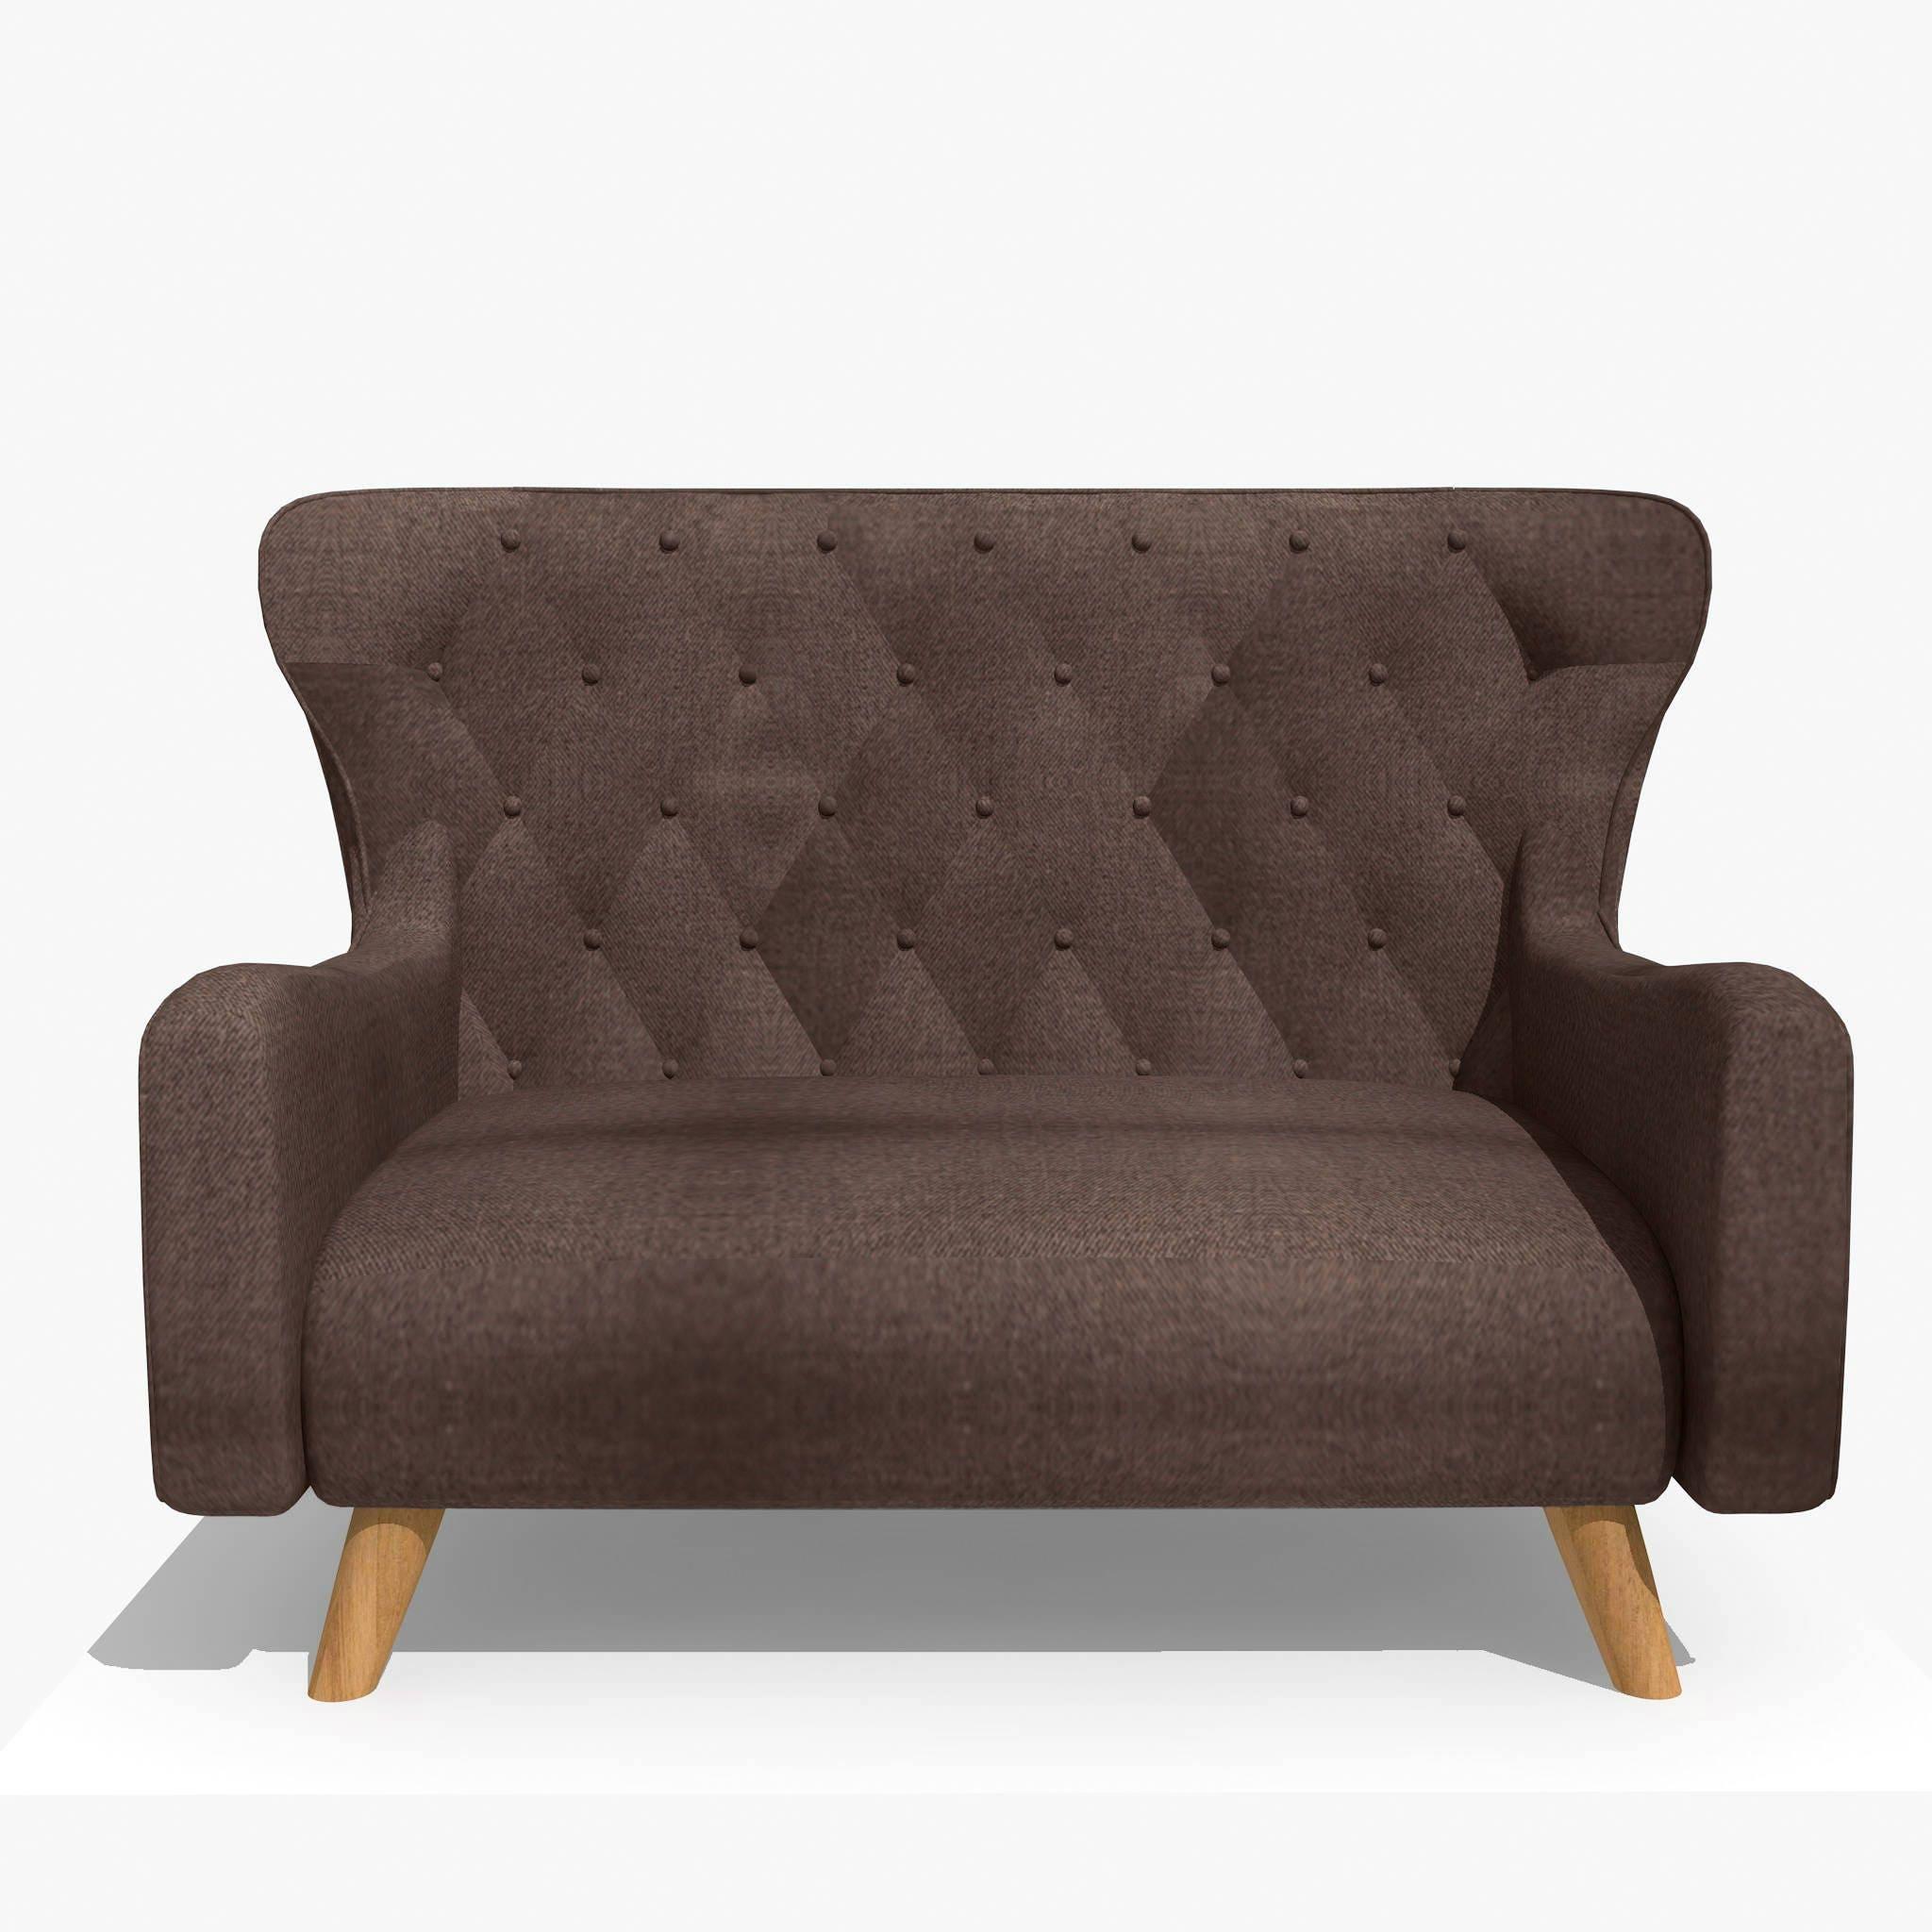 SALE 10% Prince 2 seat sofa Solid wood frame